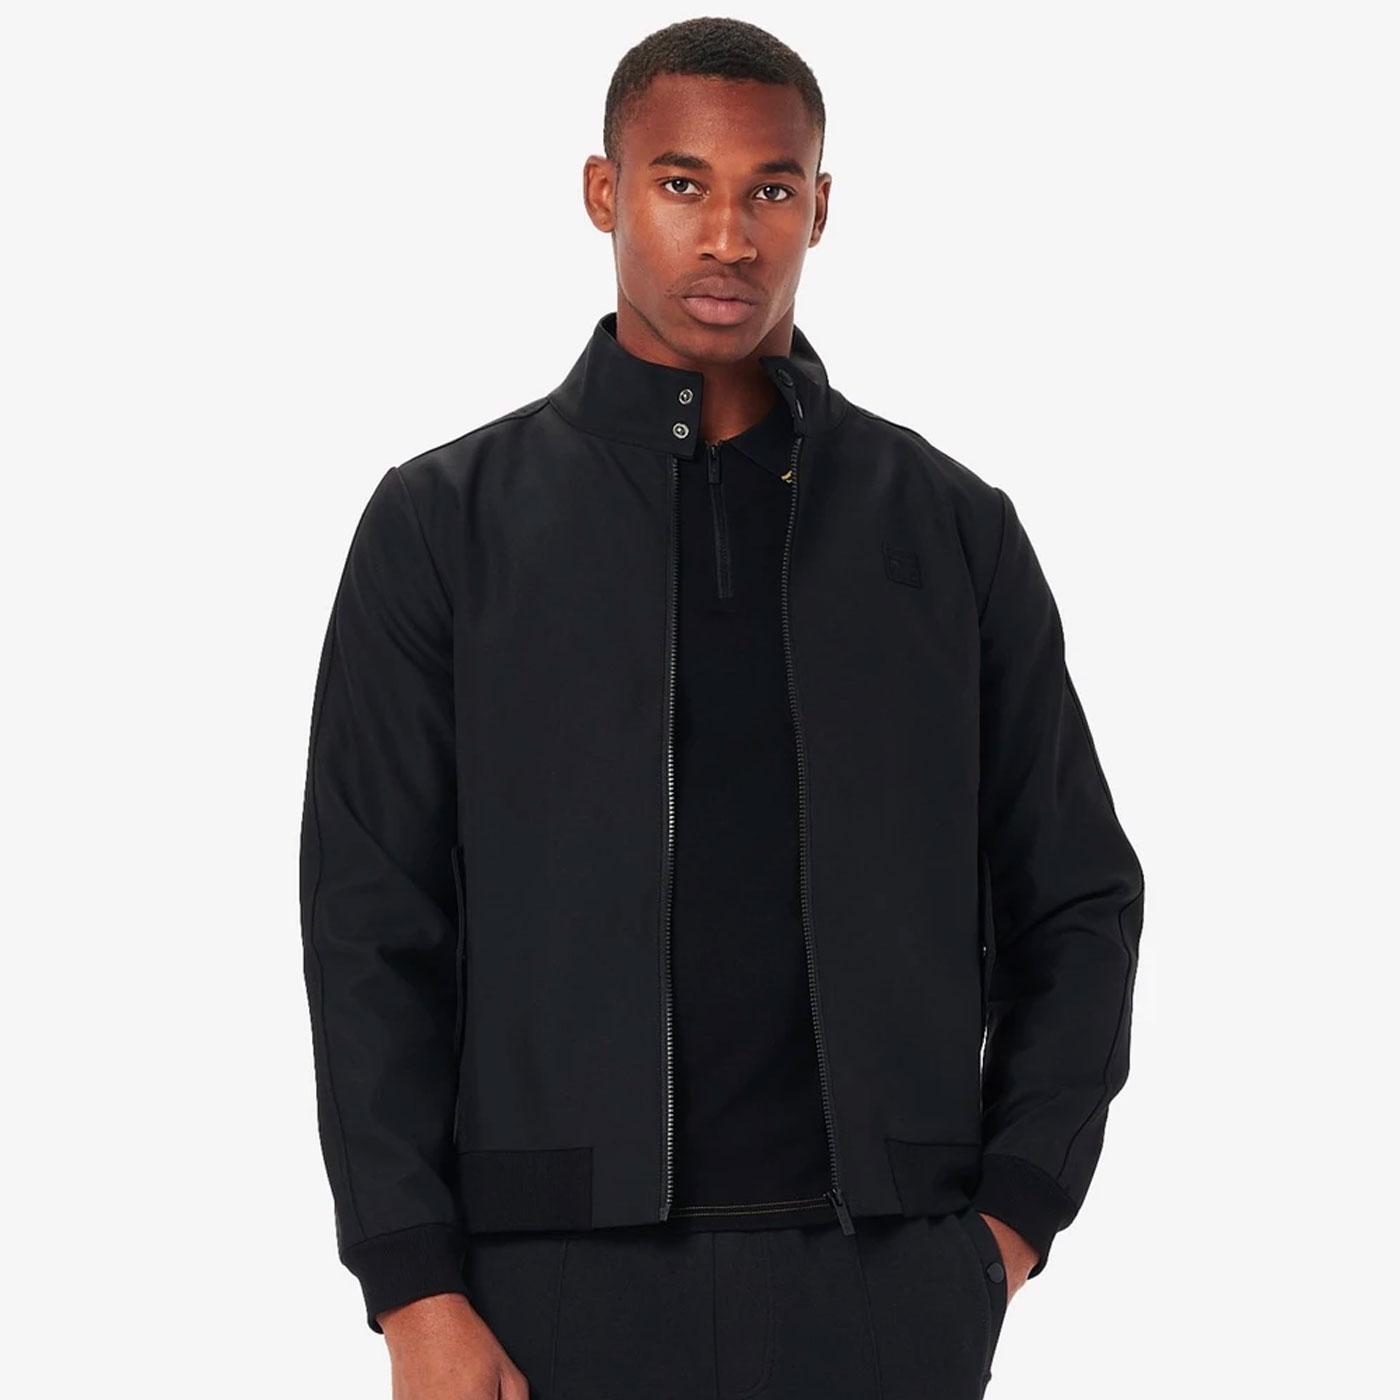 Zaful FILA VINTAGE Mod Smart Harrington Jacket